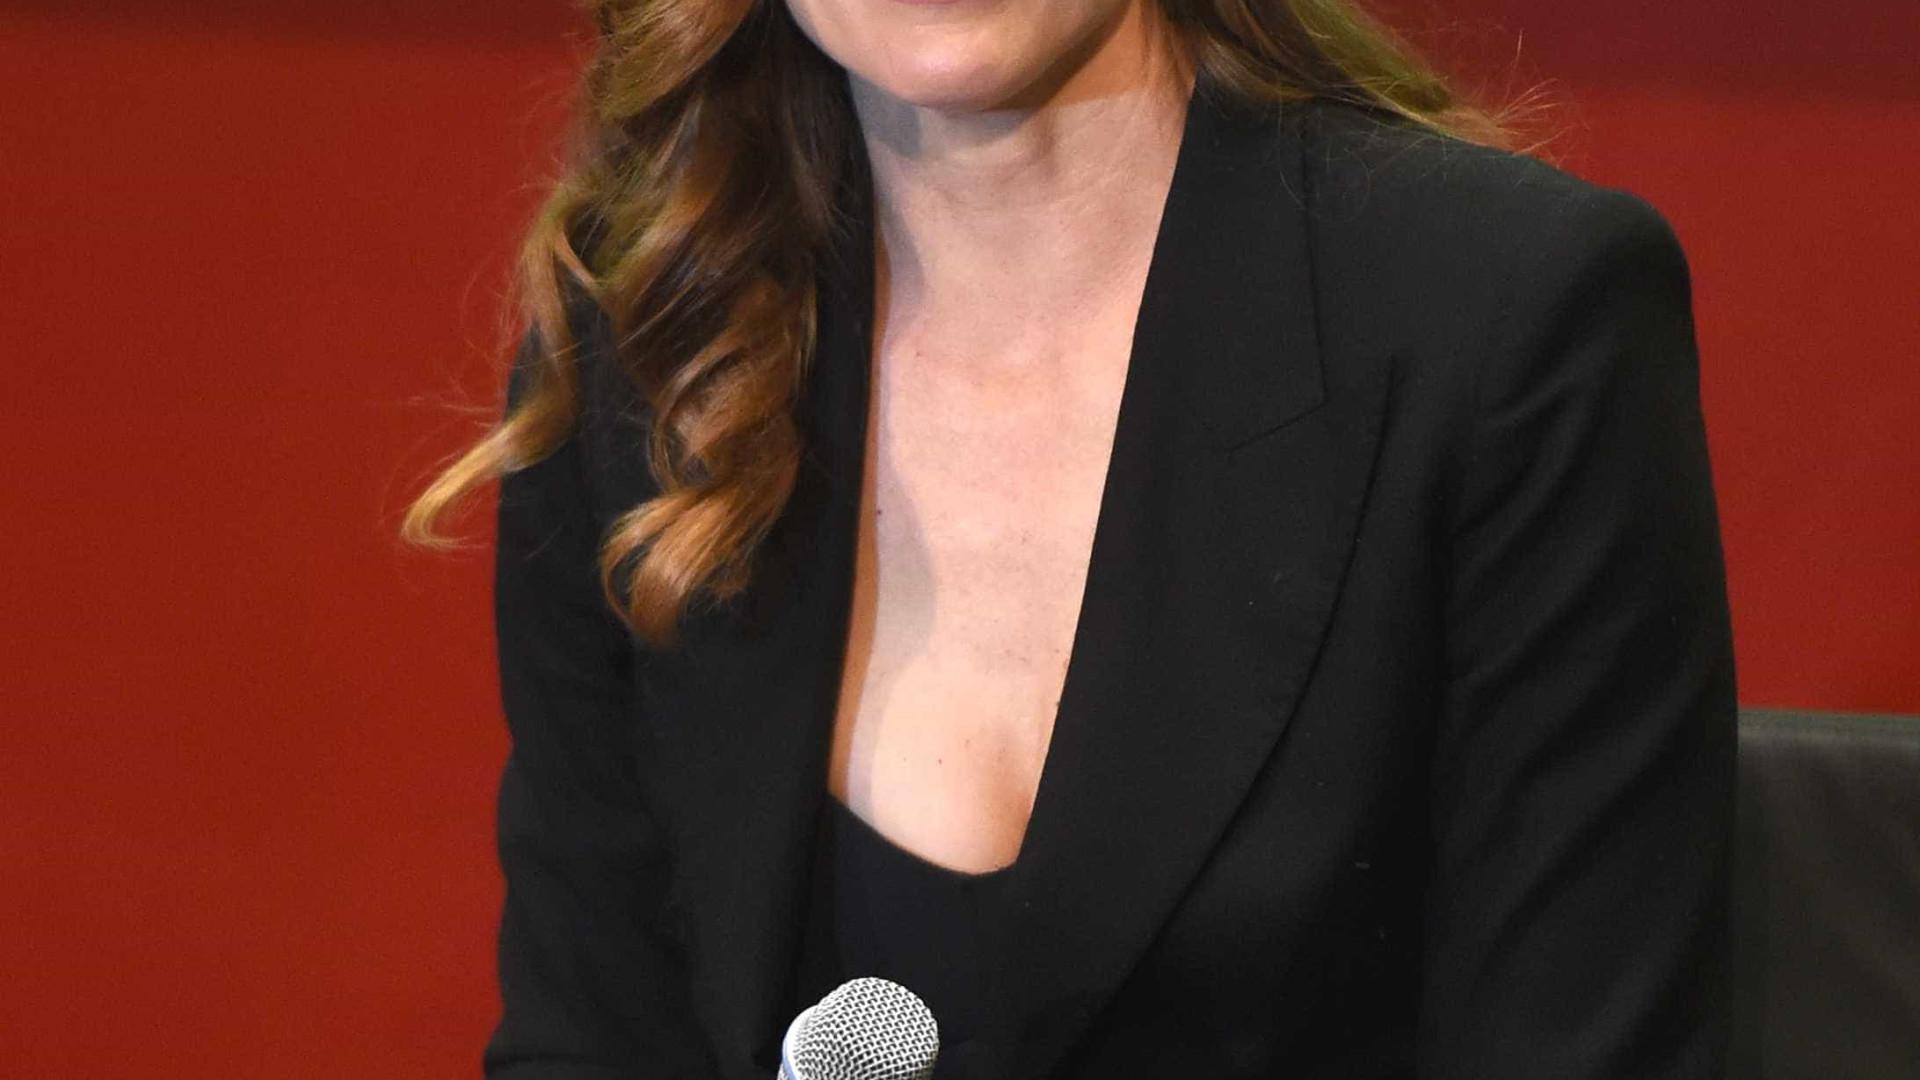 Jennifer Garner celebra marco especial no Instagram com vídeo divertido